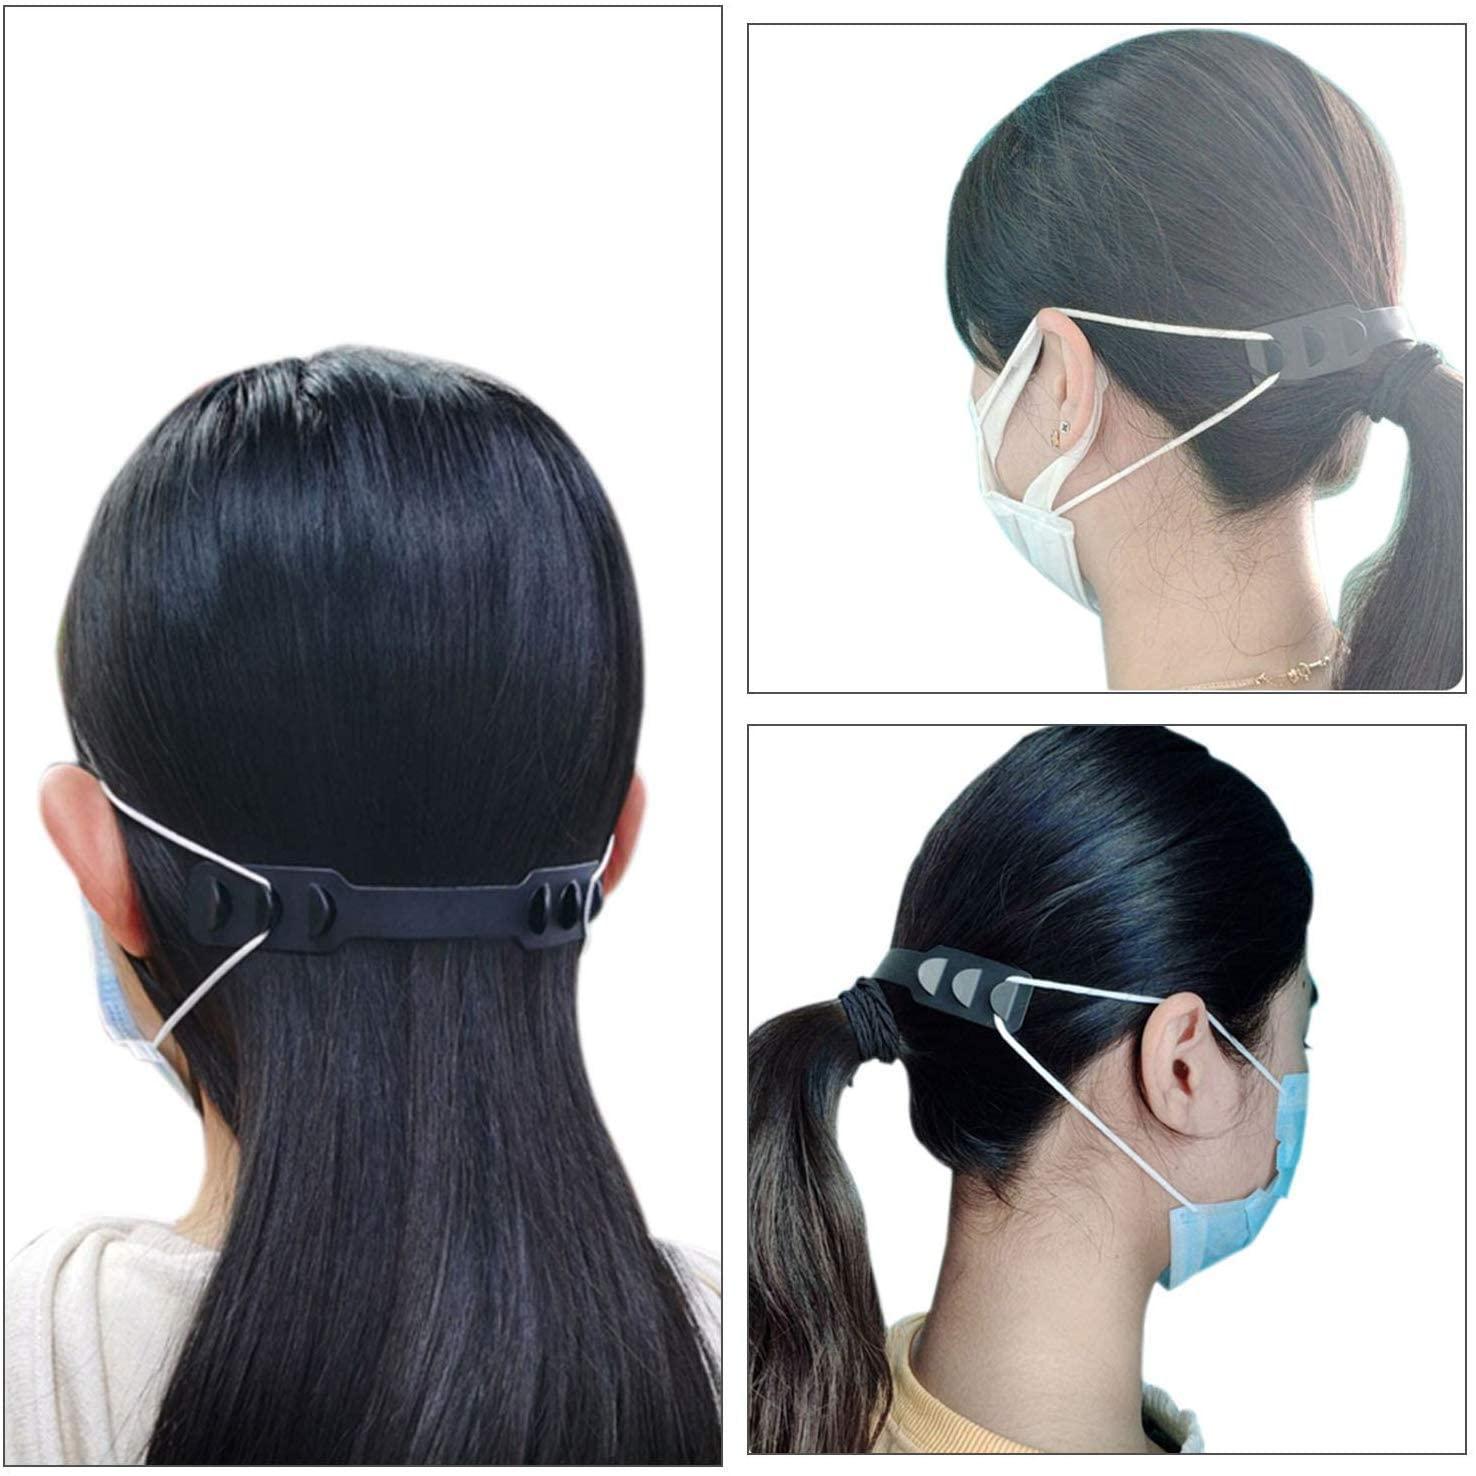 5 Pcs / Set Of Soft Mask Adjustable Ear Hook Buckle Child Adjustable Ear Pain Fixer Disposable Mask Anti-flu Anti-virus Mask